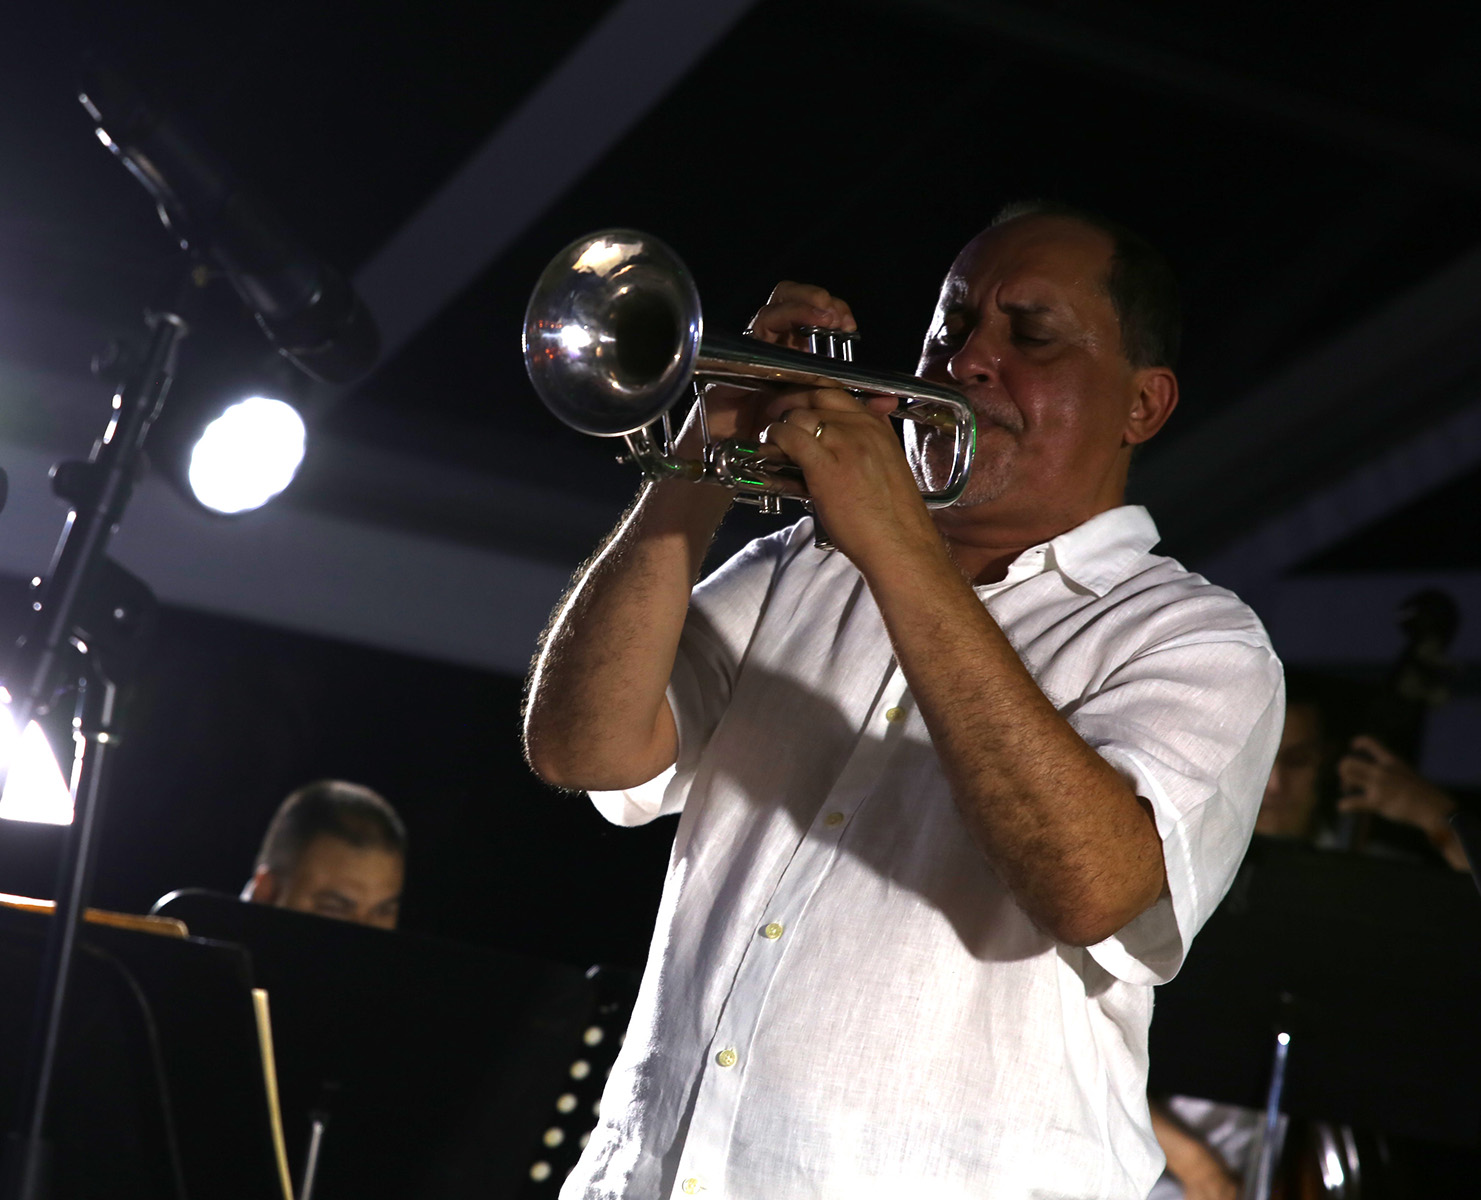 Humberto Ramirez. (José R. Pérez Centeno)